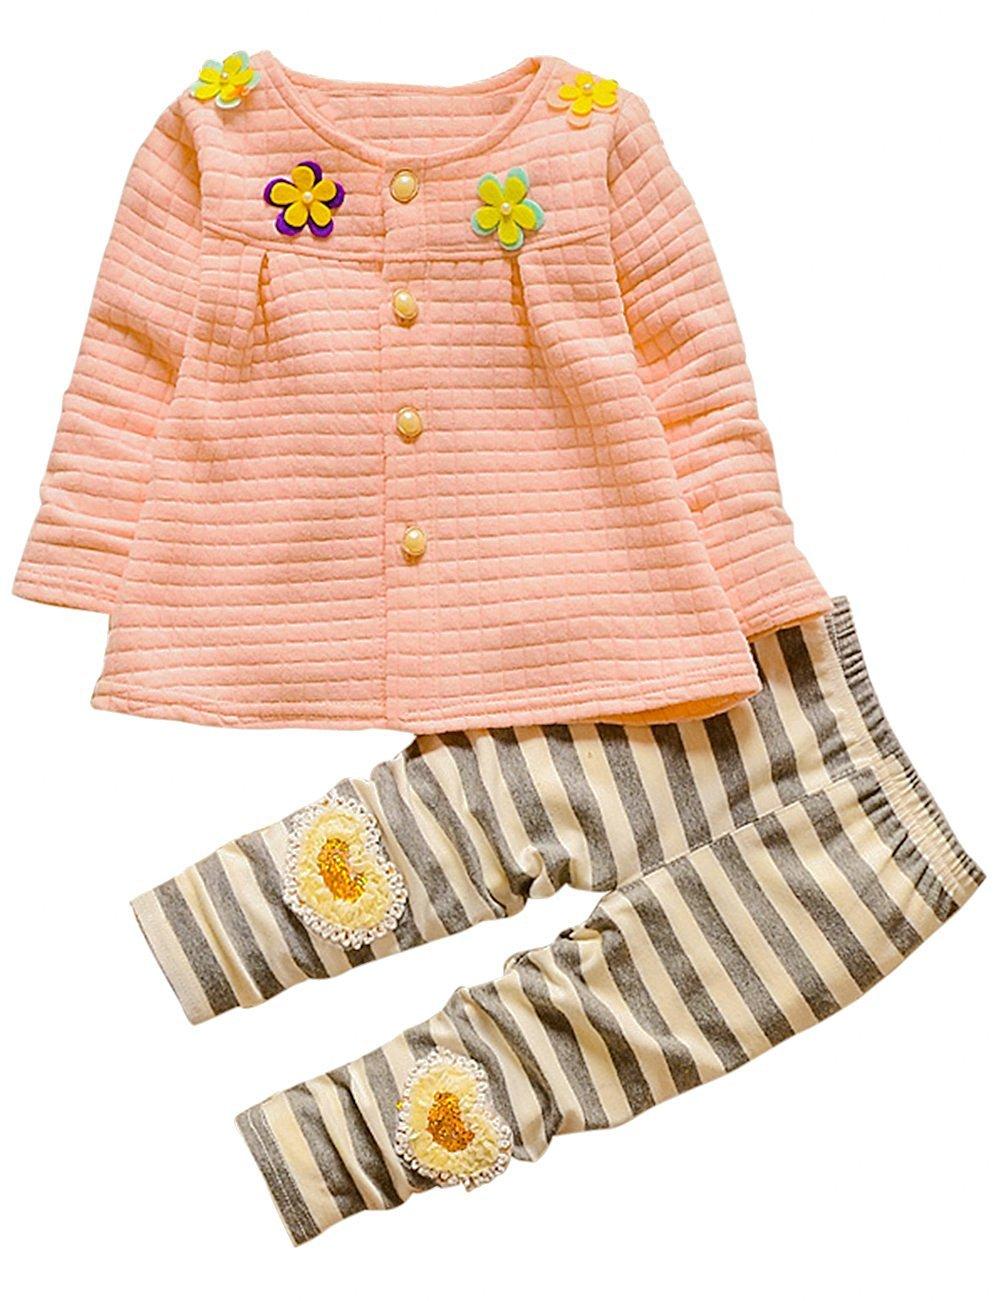 Toddlers Kids Girls Cardigan Top Leggings Pant Clothing Set Outfits